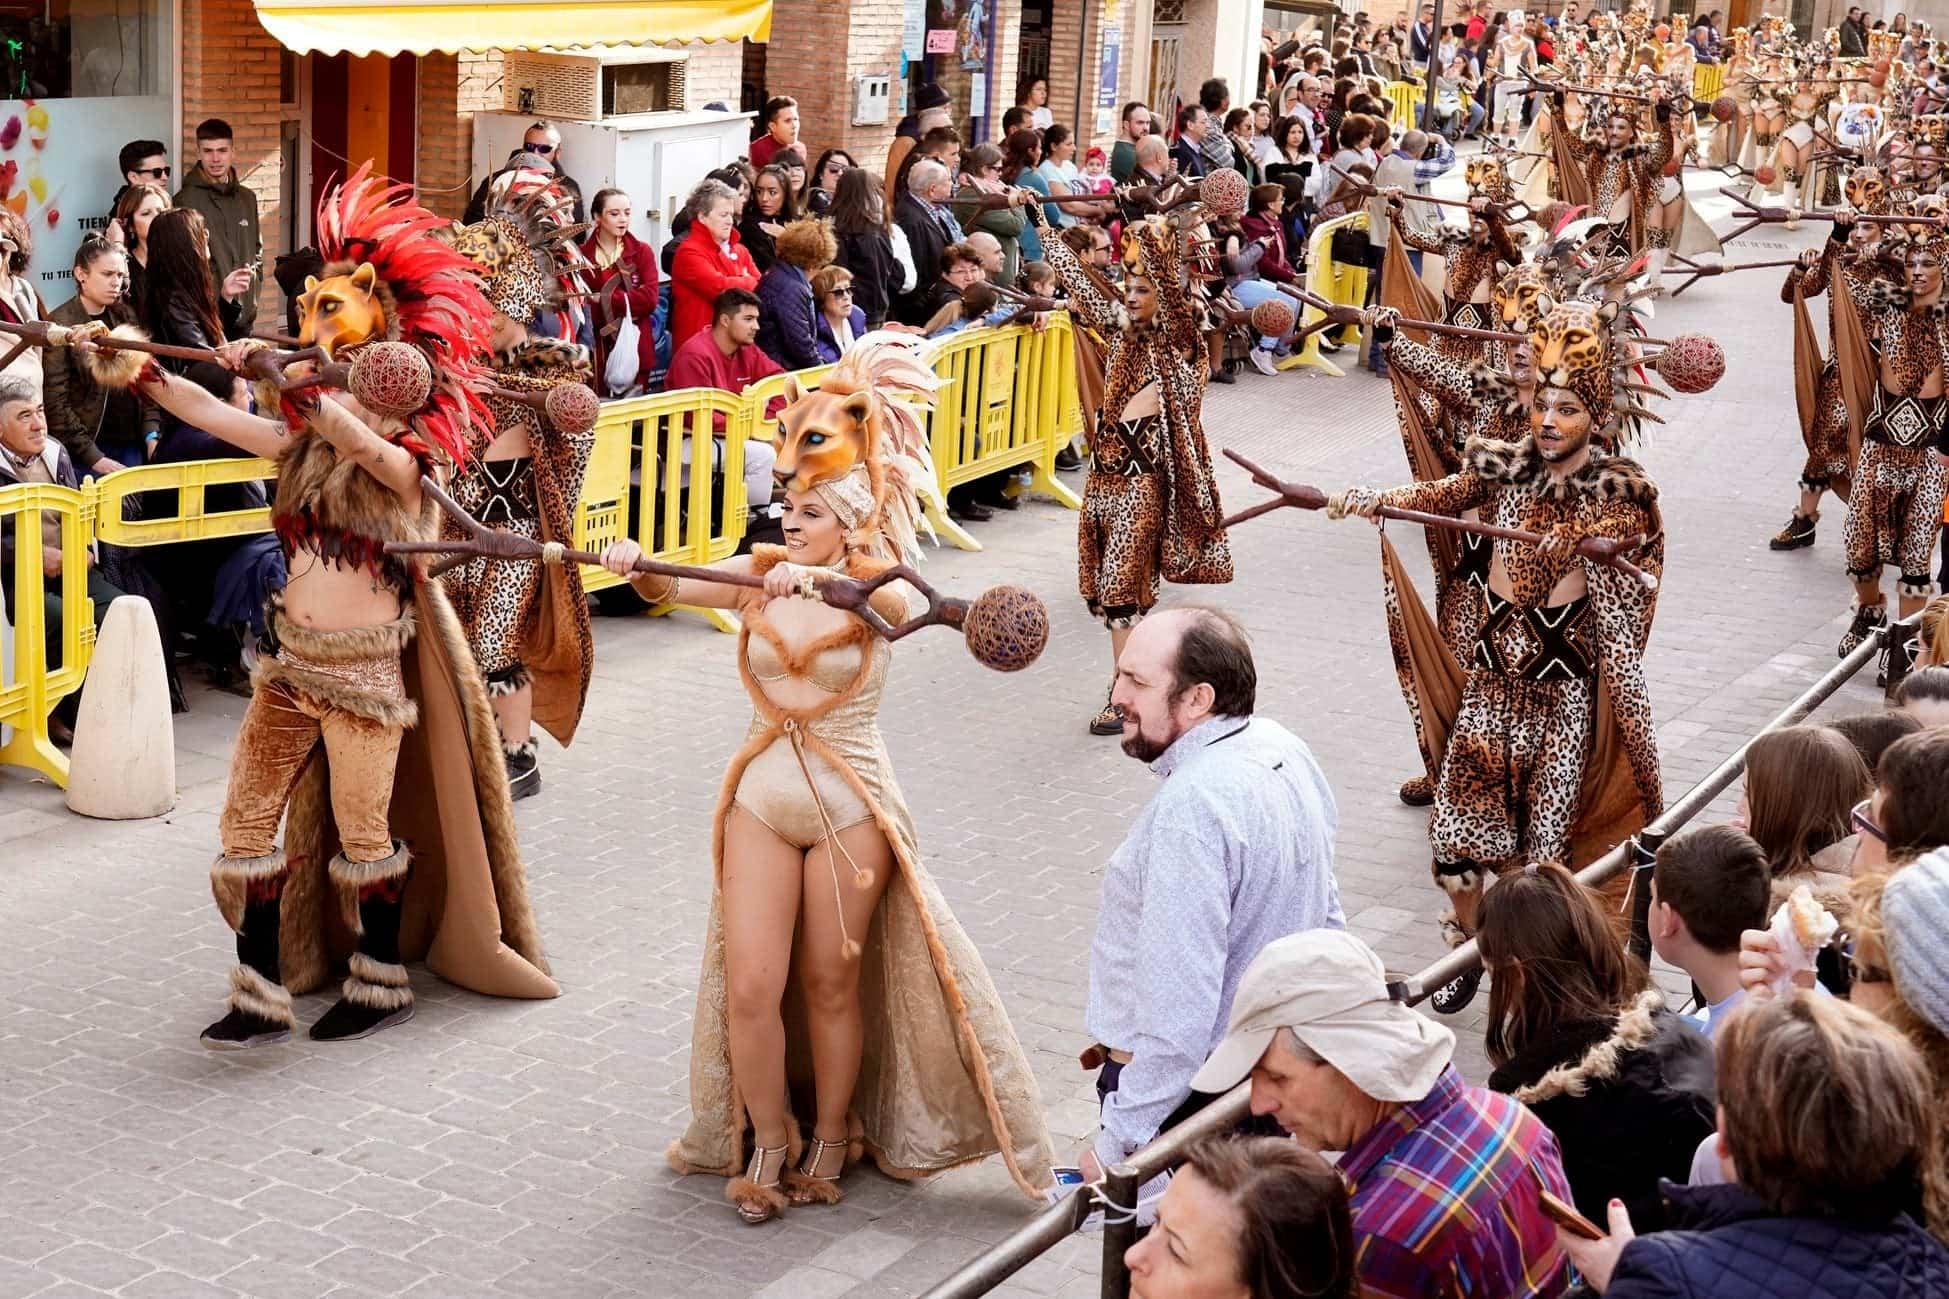 Carnaval de herencia 2020 ofertorio 136 - Selección de fotografías del Ofertorio del Carnaval de Herencia